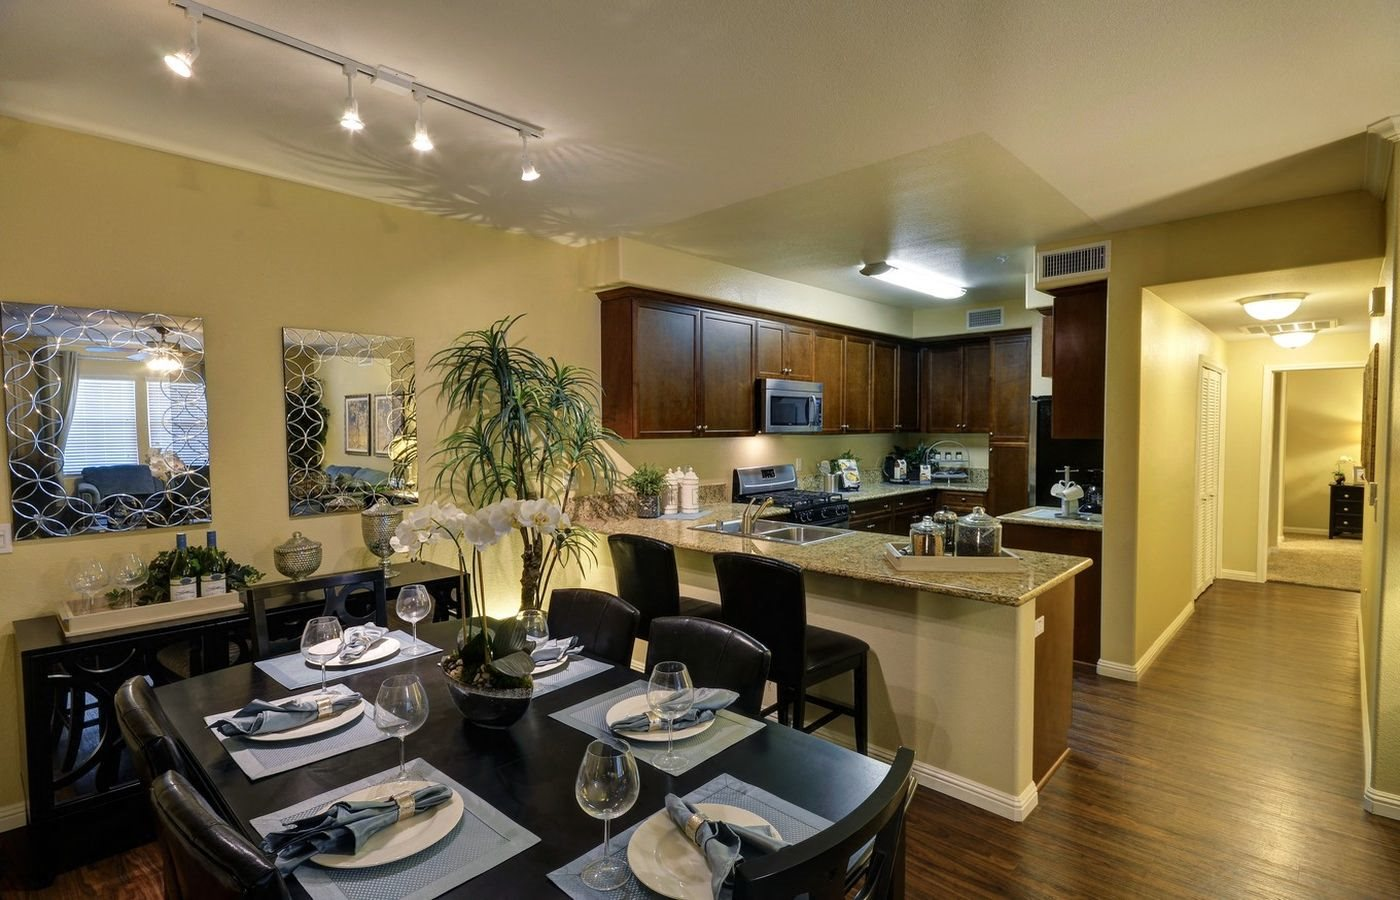 Gourmet Kitchens with Separate Dining Area, at Rosina Vista, Chula Vista, California